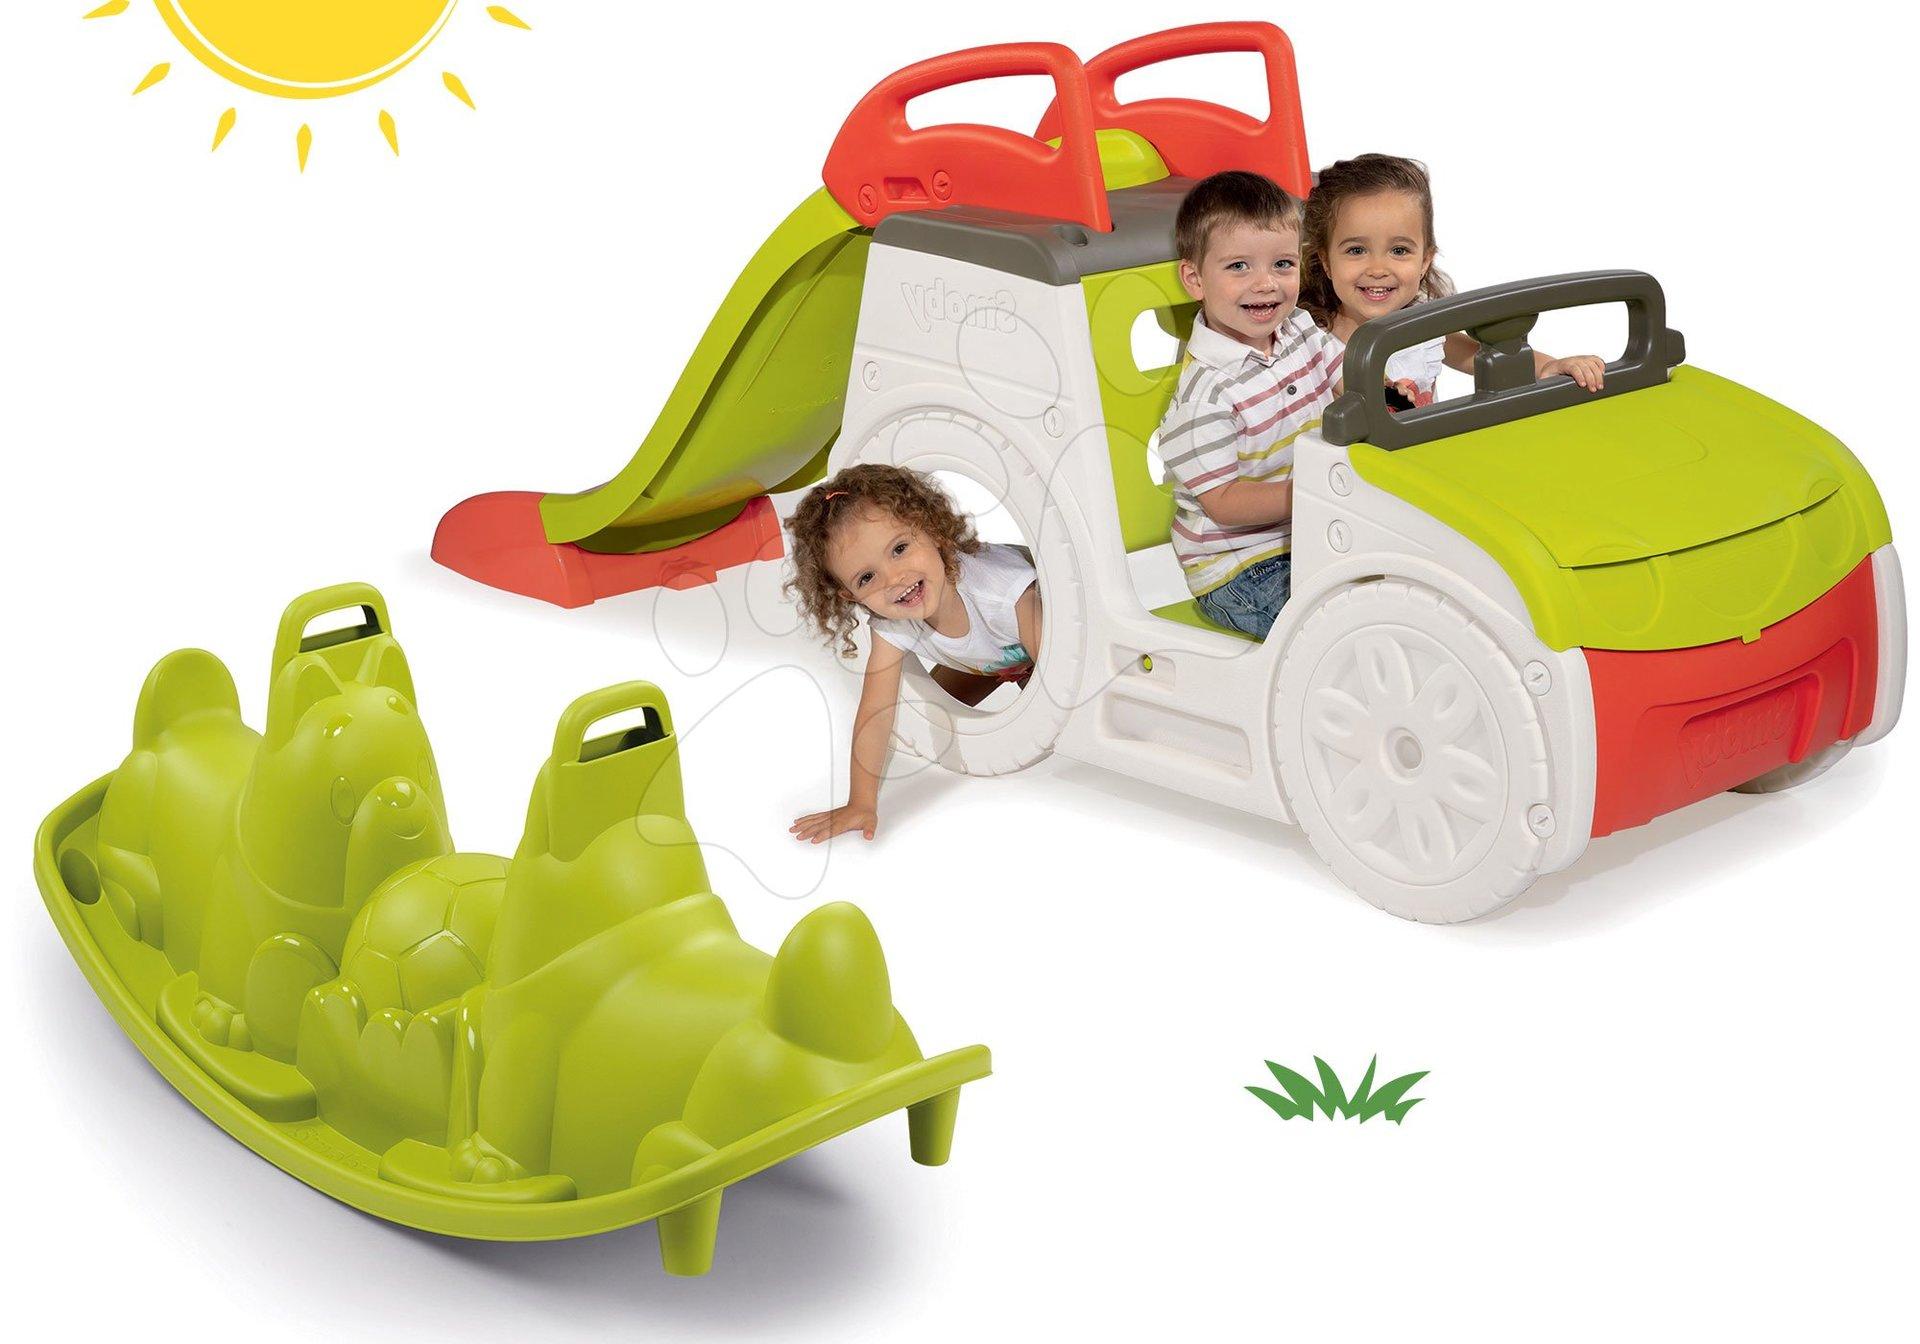 Smoby set prolézačka Adventure Car a oboustranná houpačka Tuleň 840200-3